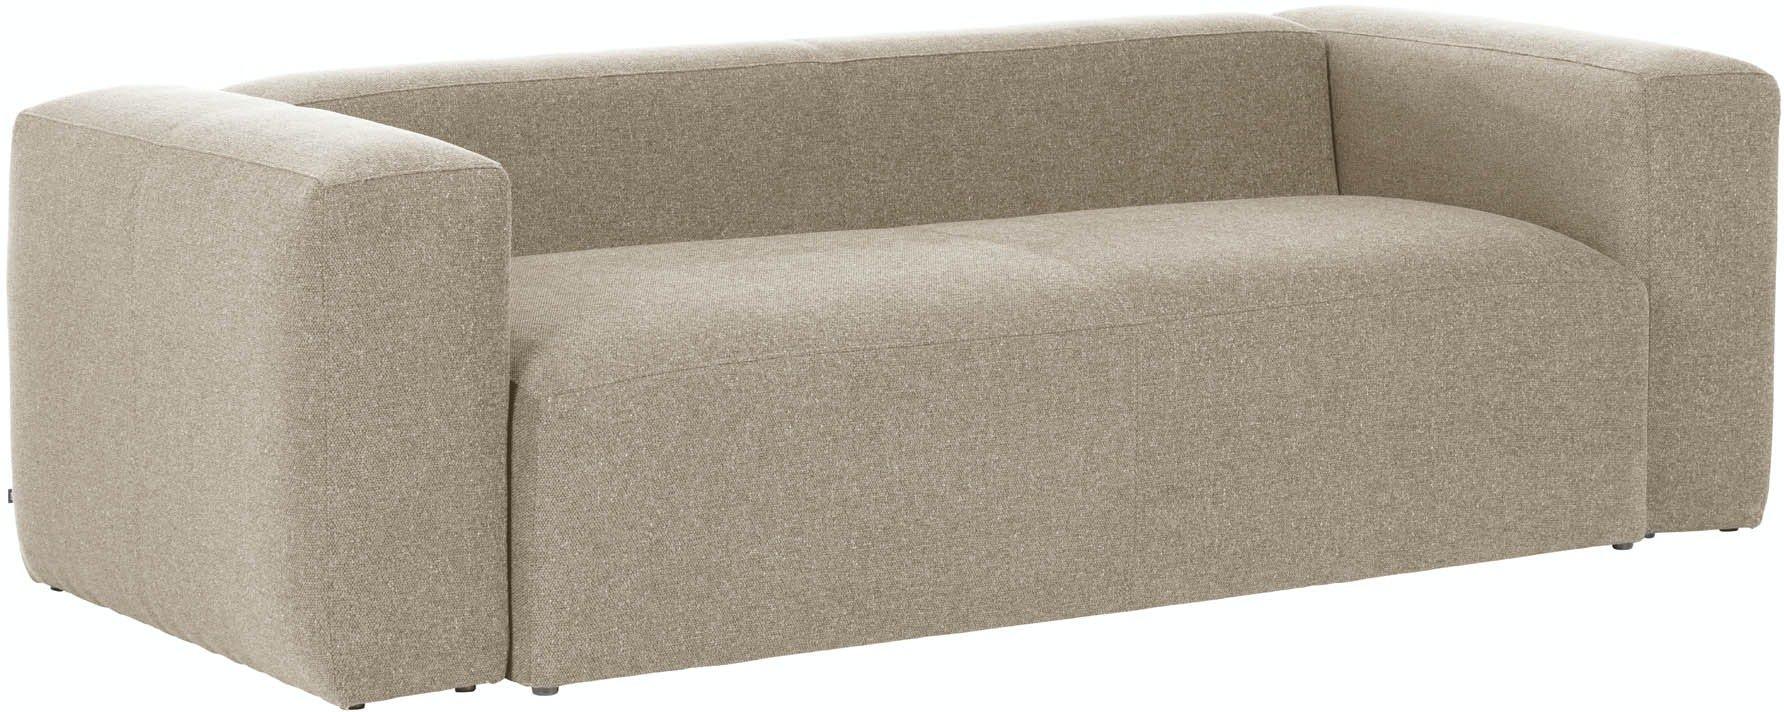 Blok, 3-personers sofa, Stof by LaForma (H: 69 cm. B: 210 cm. L: 100 cm., Beige)